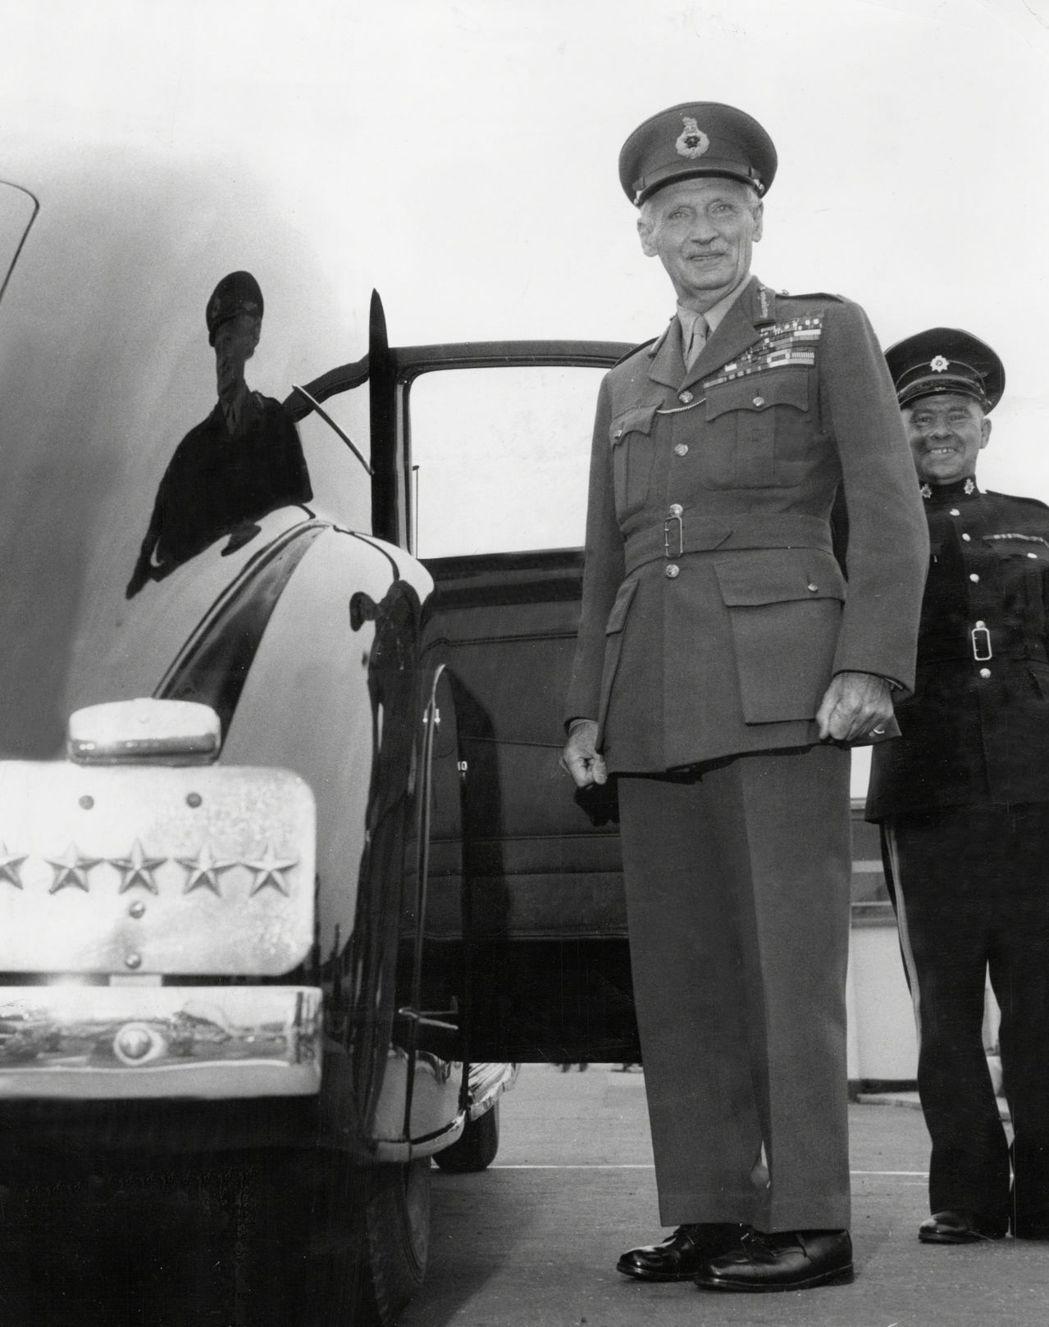 英國名將蒙哥馬利元帥(Field Marshal Bernard Law Montgomery)阿拉曼的蒙哥馬利子爵一世(1st Viscount Montgomery of Alamein)。圖/Rolls-Royce提供